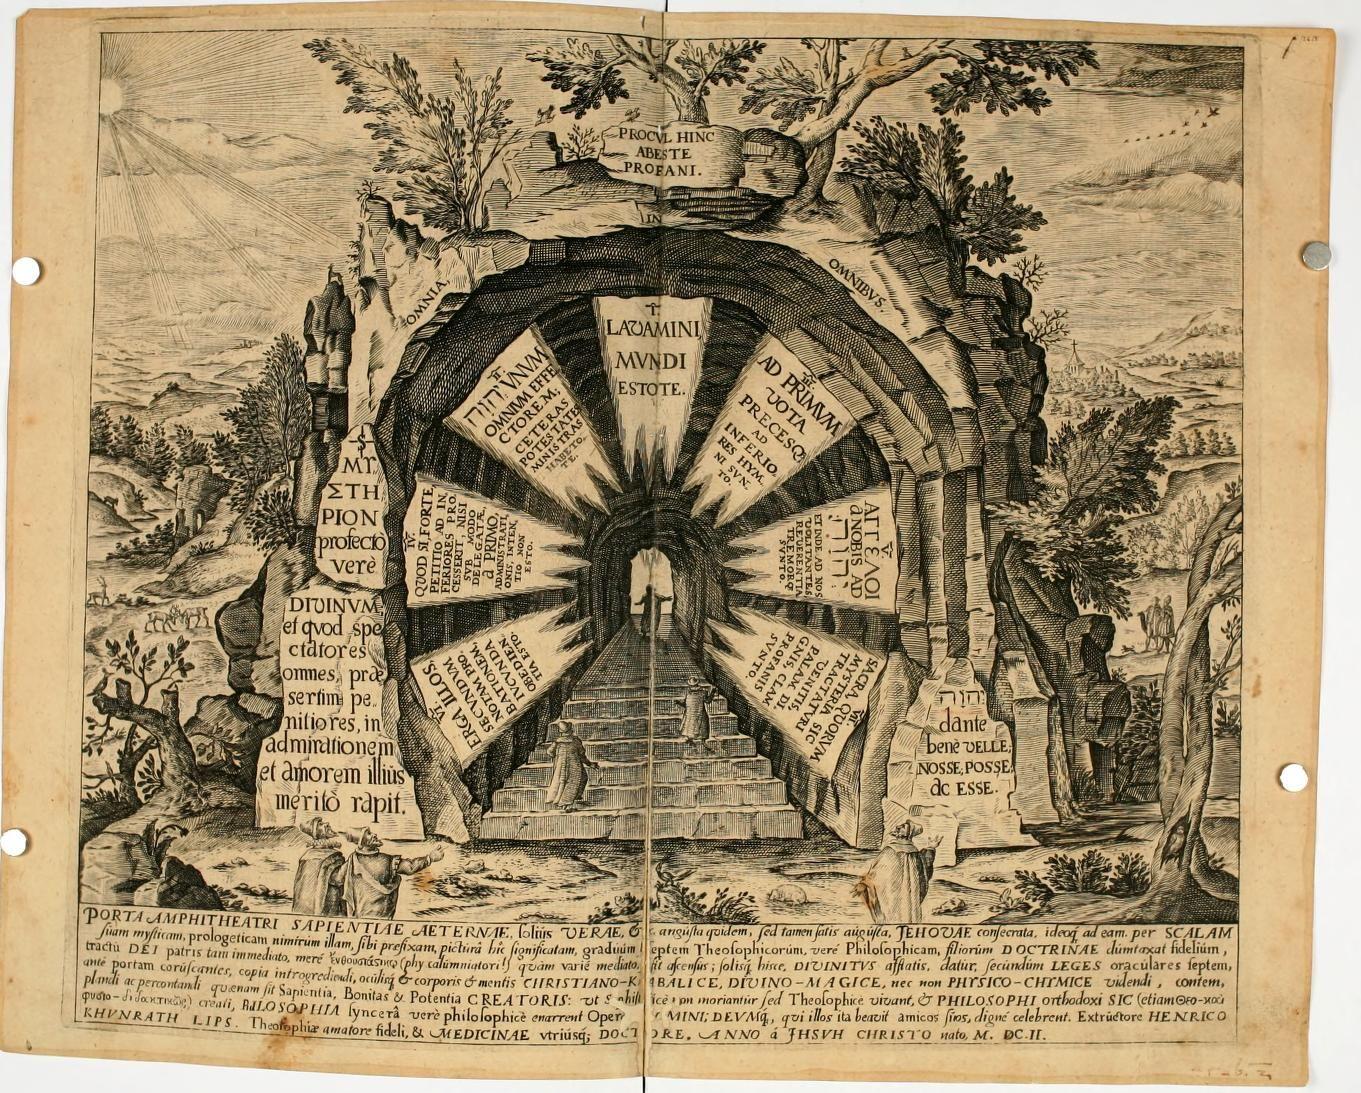 Amphitheatrvm sapientiae aeternae : solius verae, christiano-kabalisticvm, divino-magicvm, nec non physico-chymicvm, tertrivnvm, catholicon by Khunrath, Heinrich, 1560-1605; Vries, H. F; Diricks van Campen, Jan, 17th cent; Doort, Peter van der, fl. 1590-1602  Published 1609    https://ia700507.us.archive.org/BookReader/BookReaderImages.php?zip=/16/items/amphitheatrvmsap00khun/amphitheatrvmsap00khun_jp2.zip&file=amphitheatrvmsap00khun_jp2/amphitheatrvmsap00khun_0022.jp2&scale=2&rotate=0